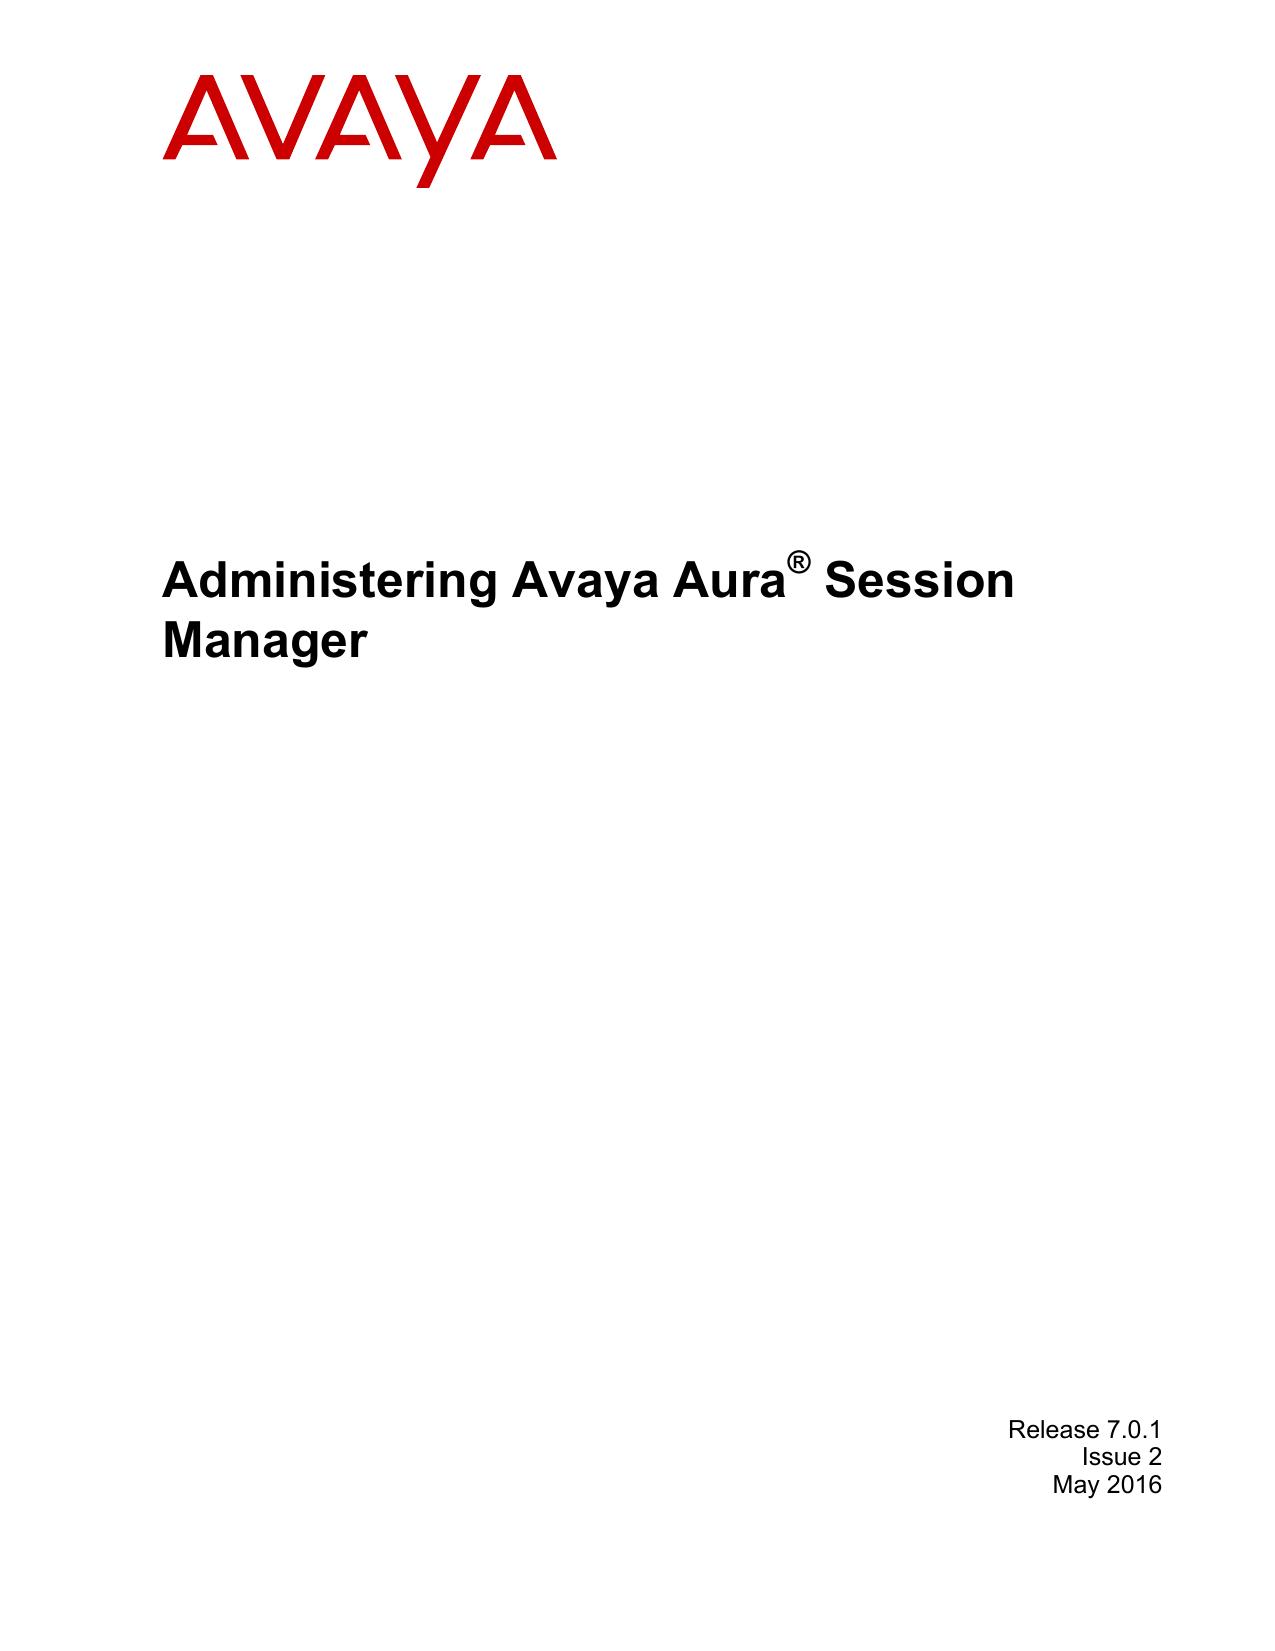 Administering Avaya Aura® Session Manager | manualzz com